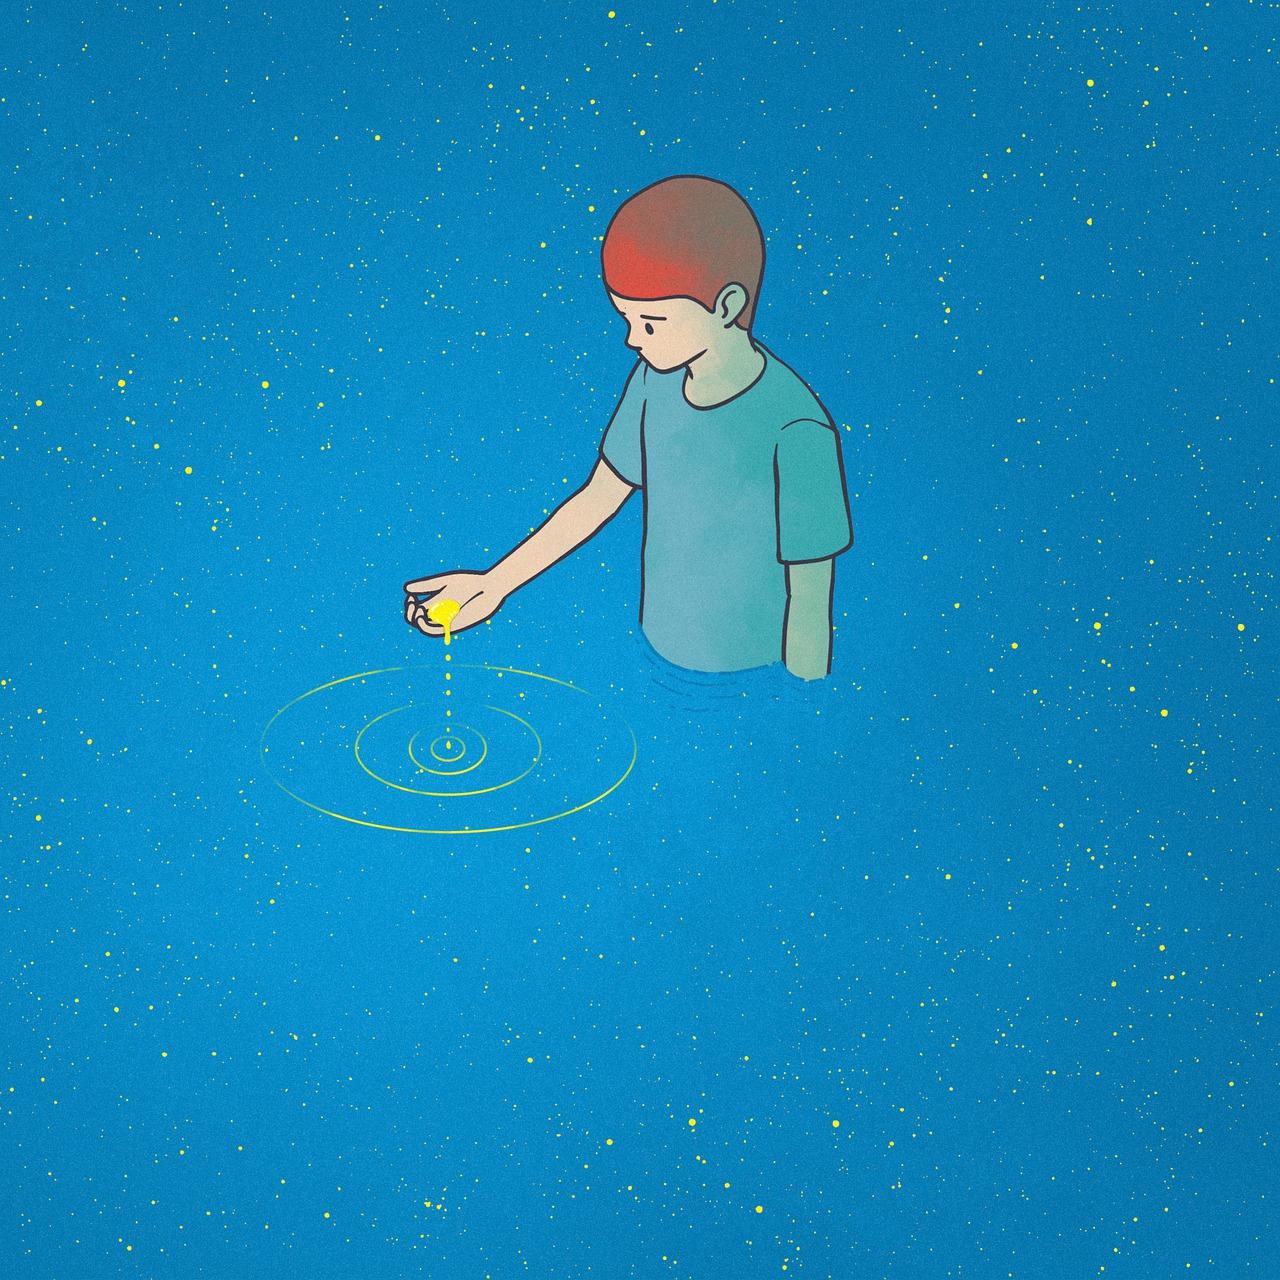 cartoon-5190947_1280